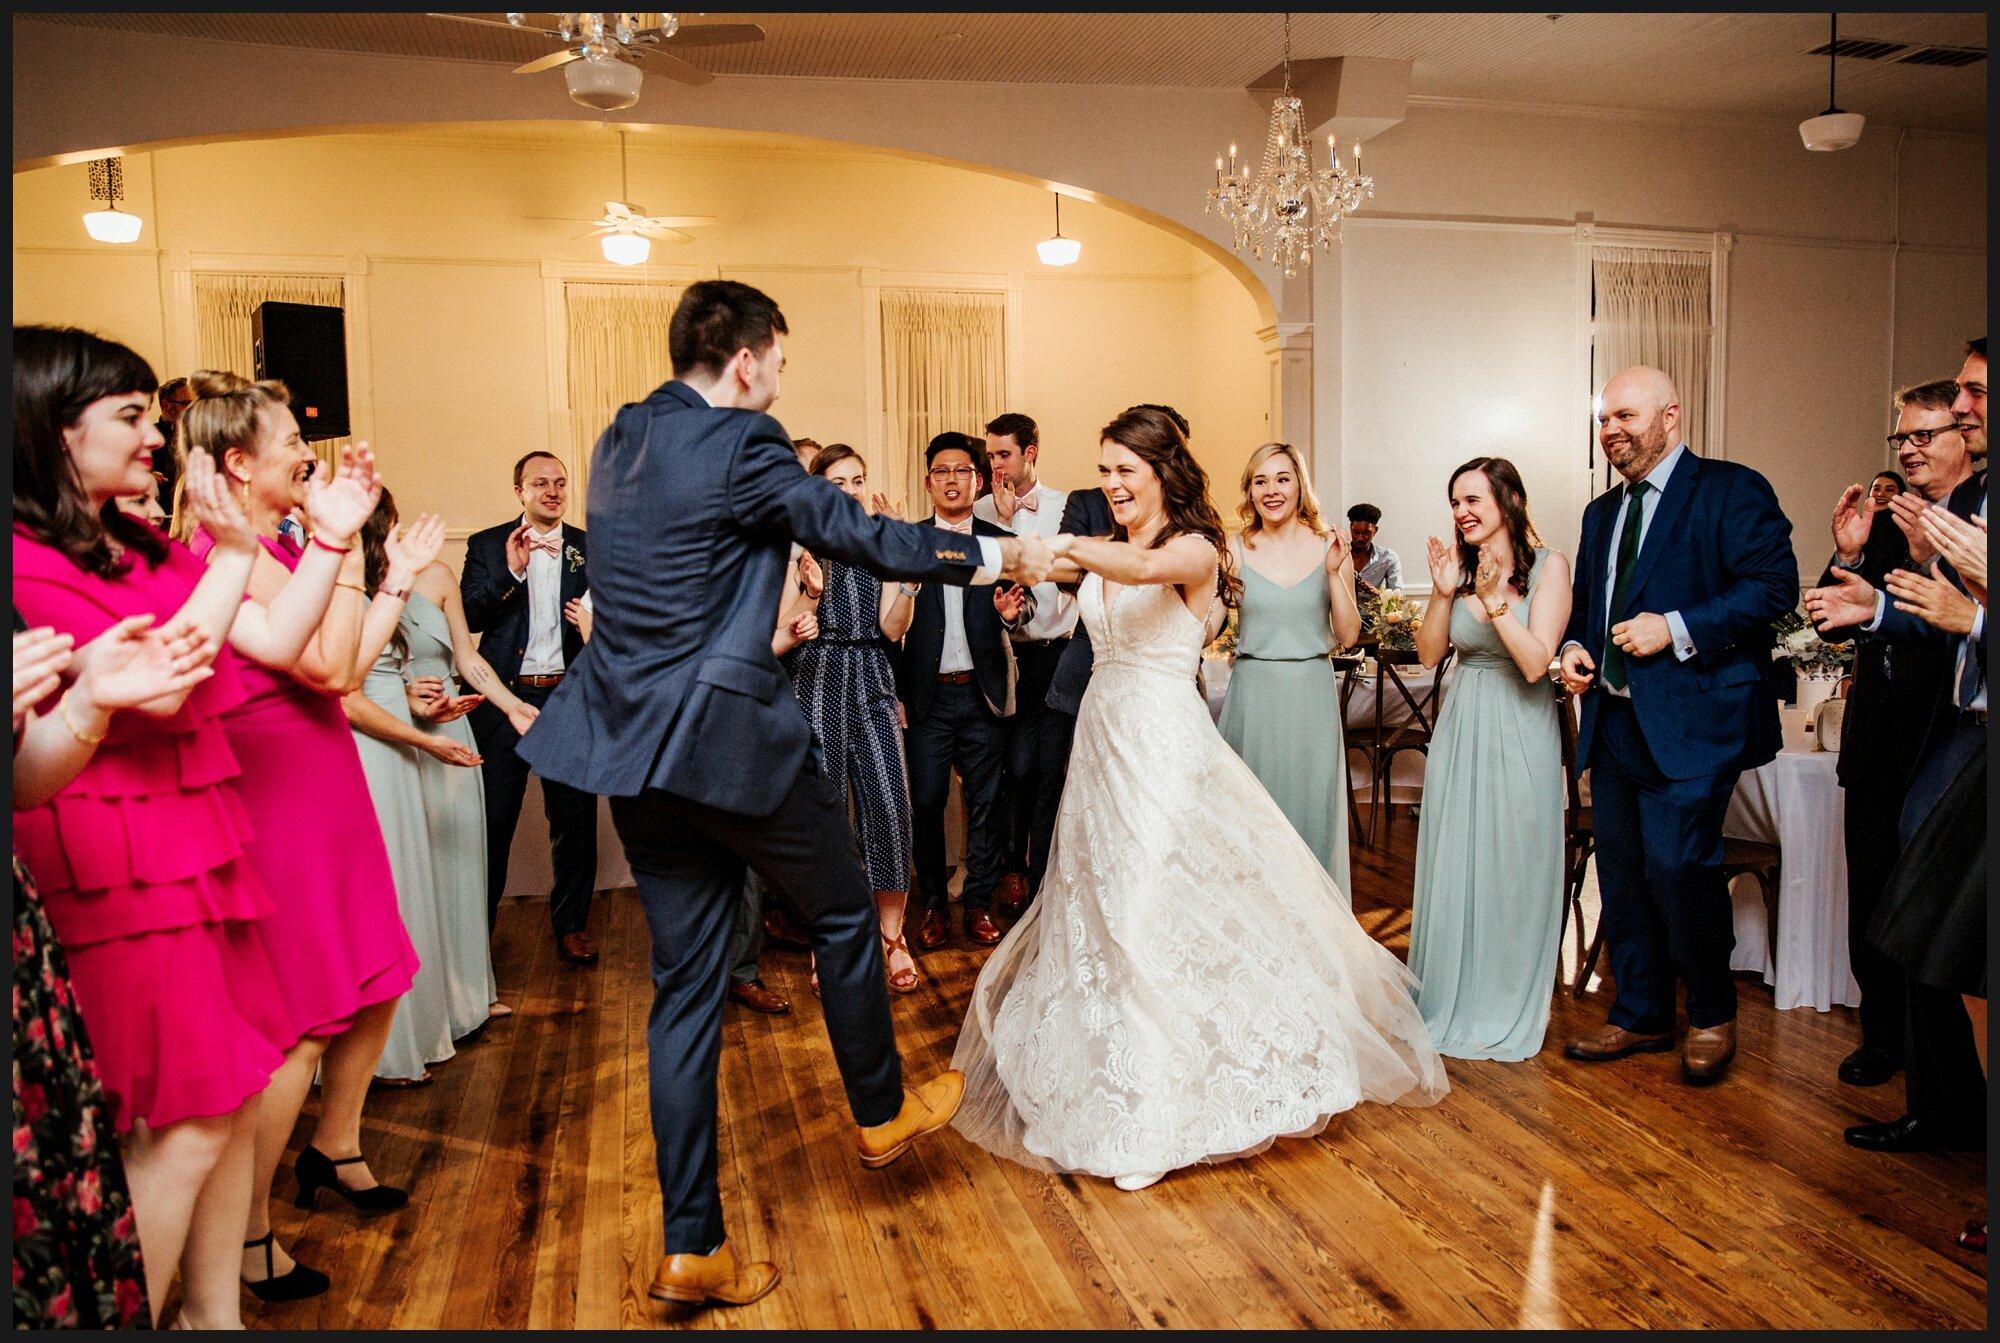 Orlando-Wedding-Photographer-destination-wedding-photographer-florida-wedding-photographer-hawaii-wedding-photographer_0693.jpg